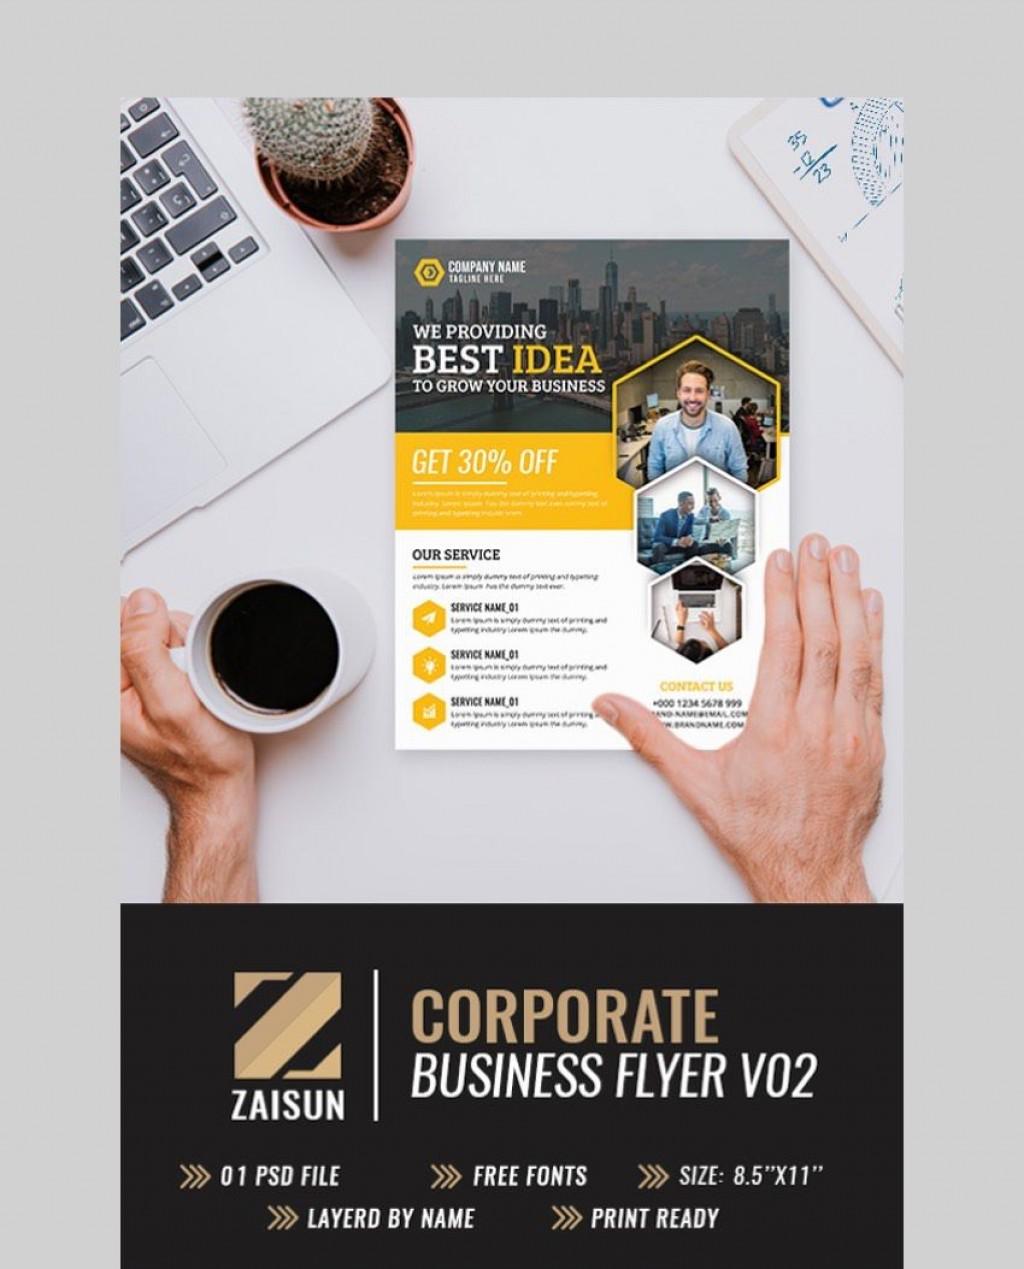 005 Formidable Busines Flyer Template Free Inspiration  Psd 2018 Vector Brochure TrainingLarge